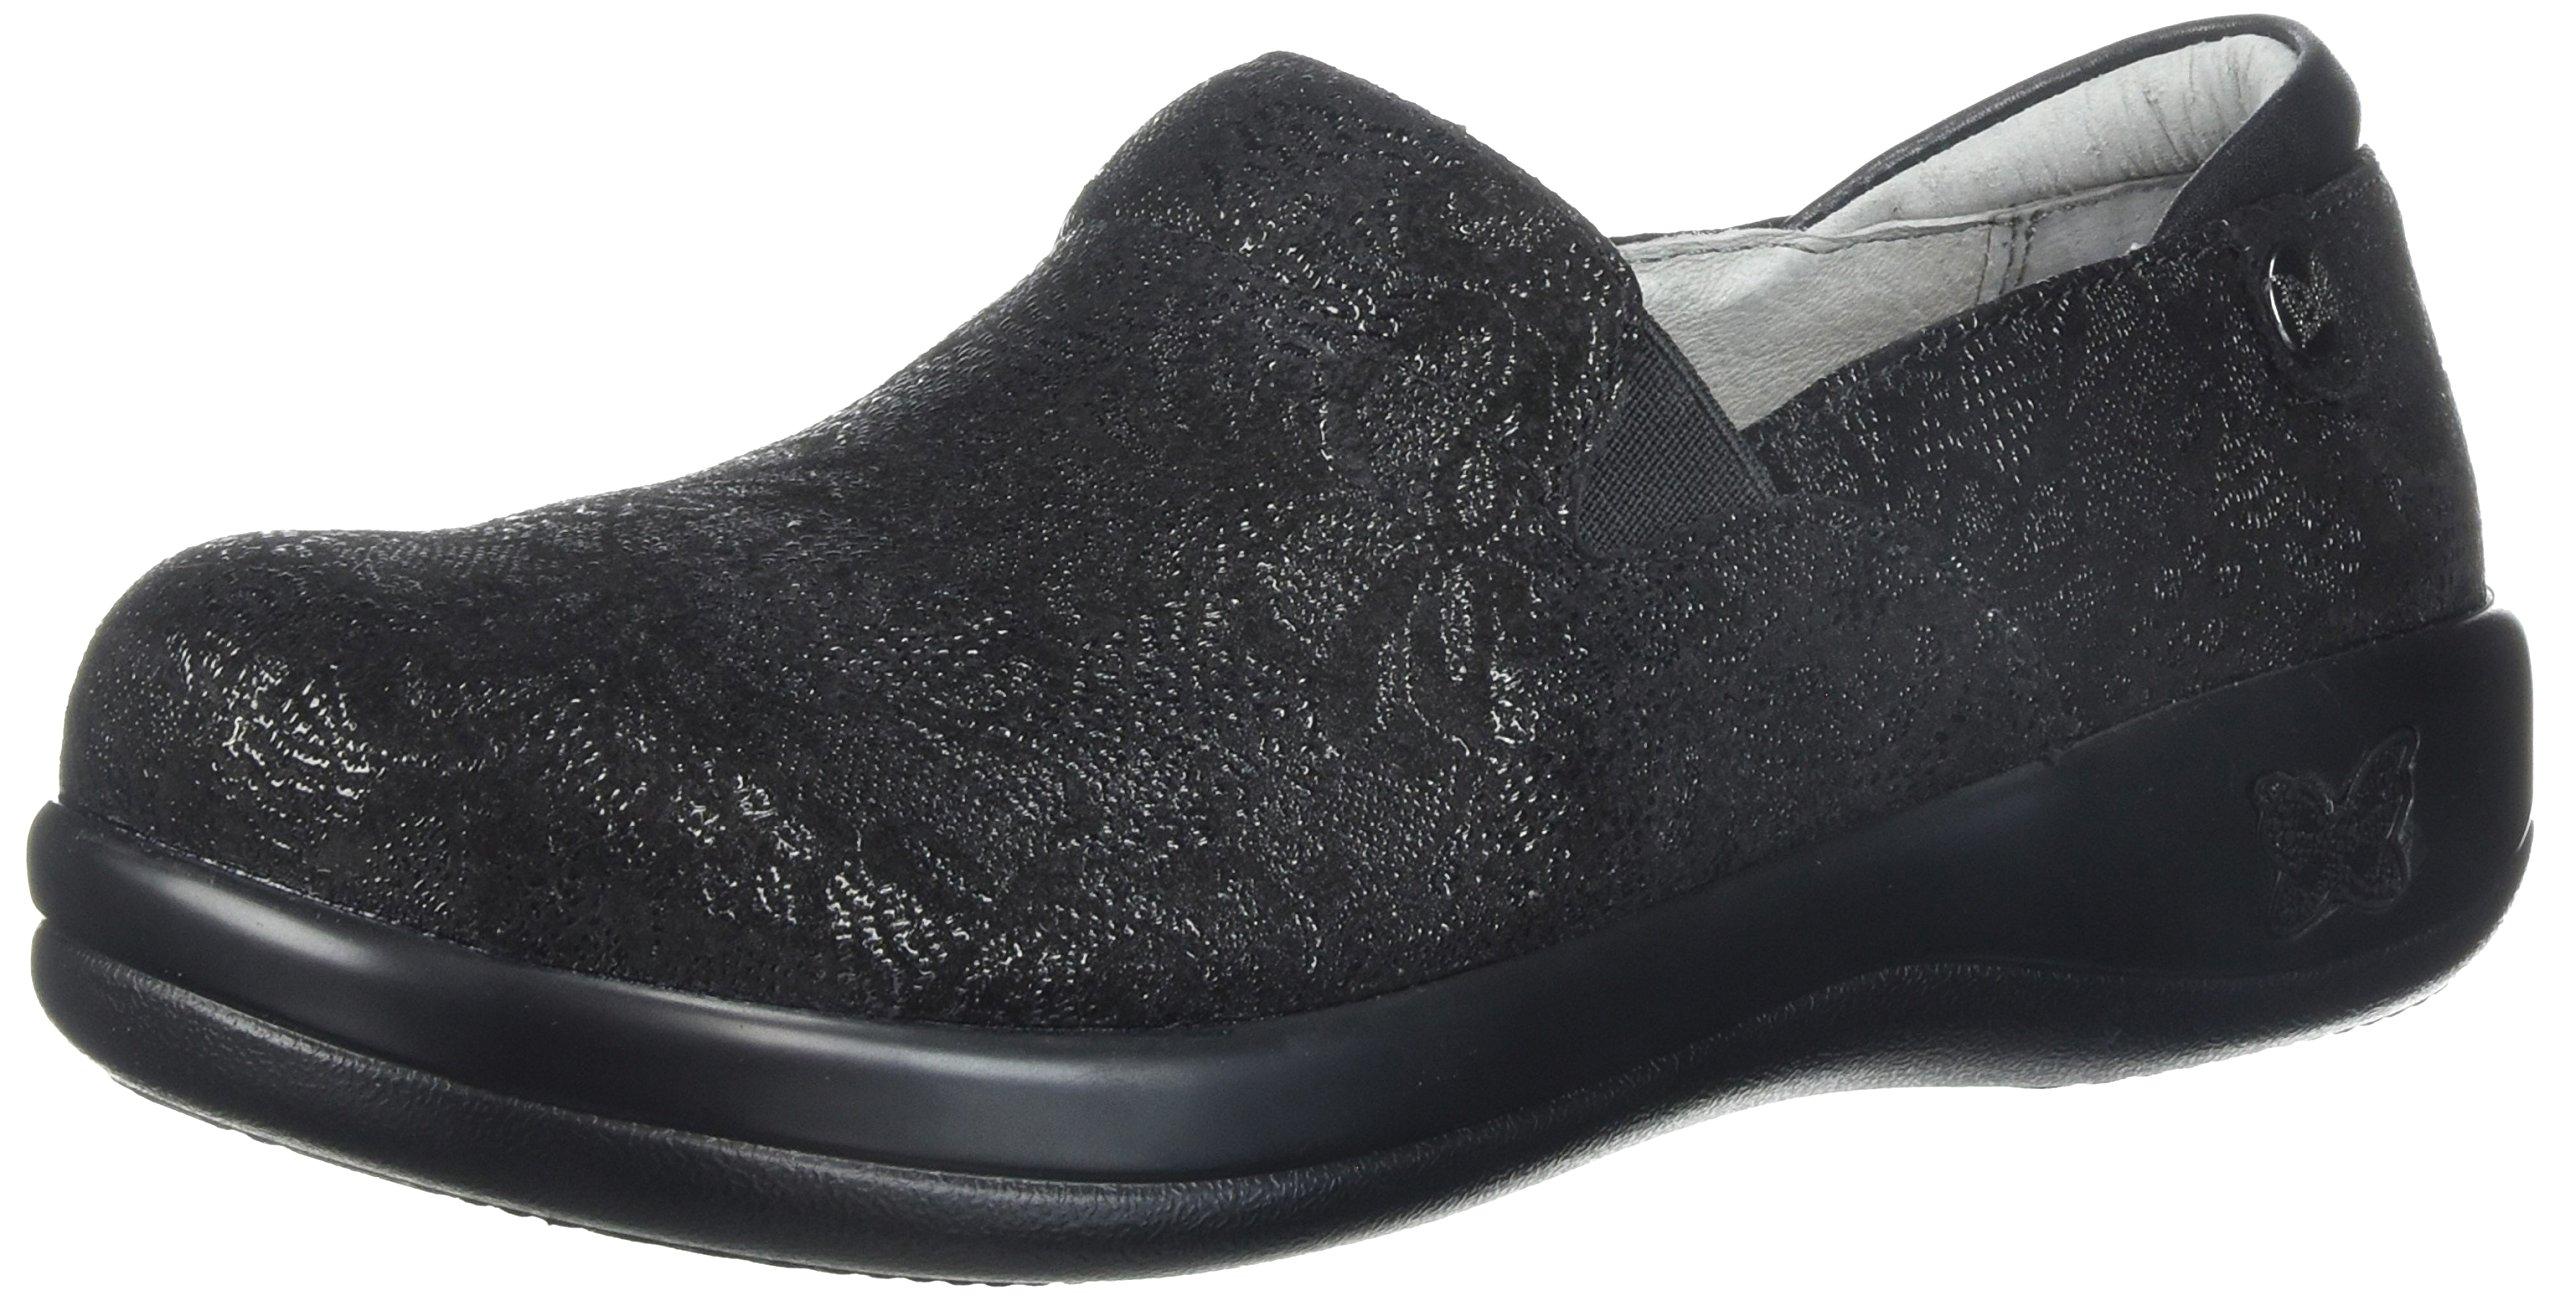 Alegria Women's Keli Loafer, Black Leaf, 40 Medium EU (9.5-10 US)